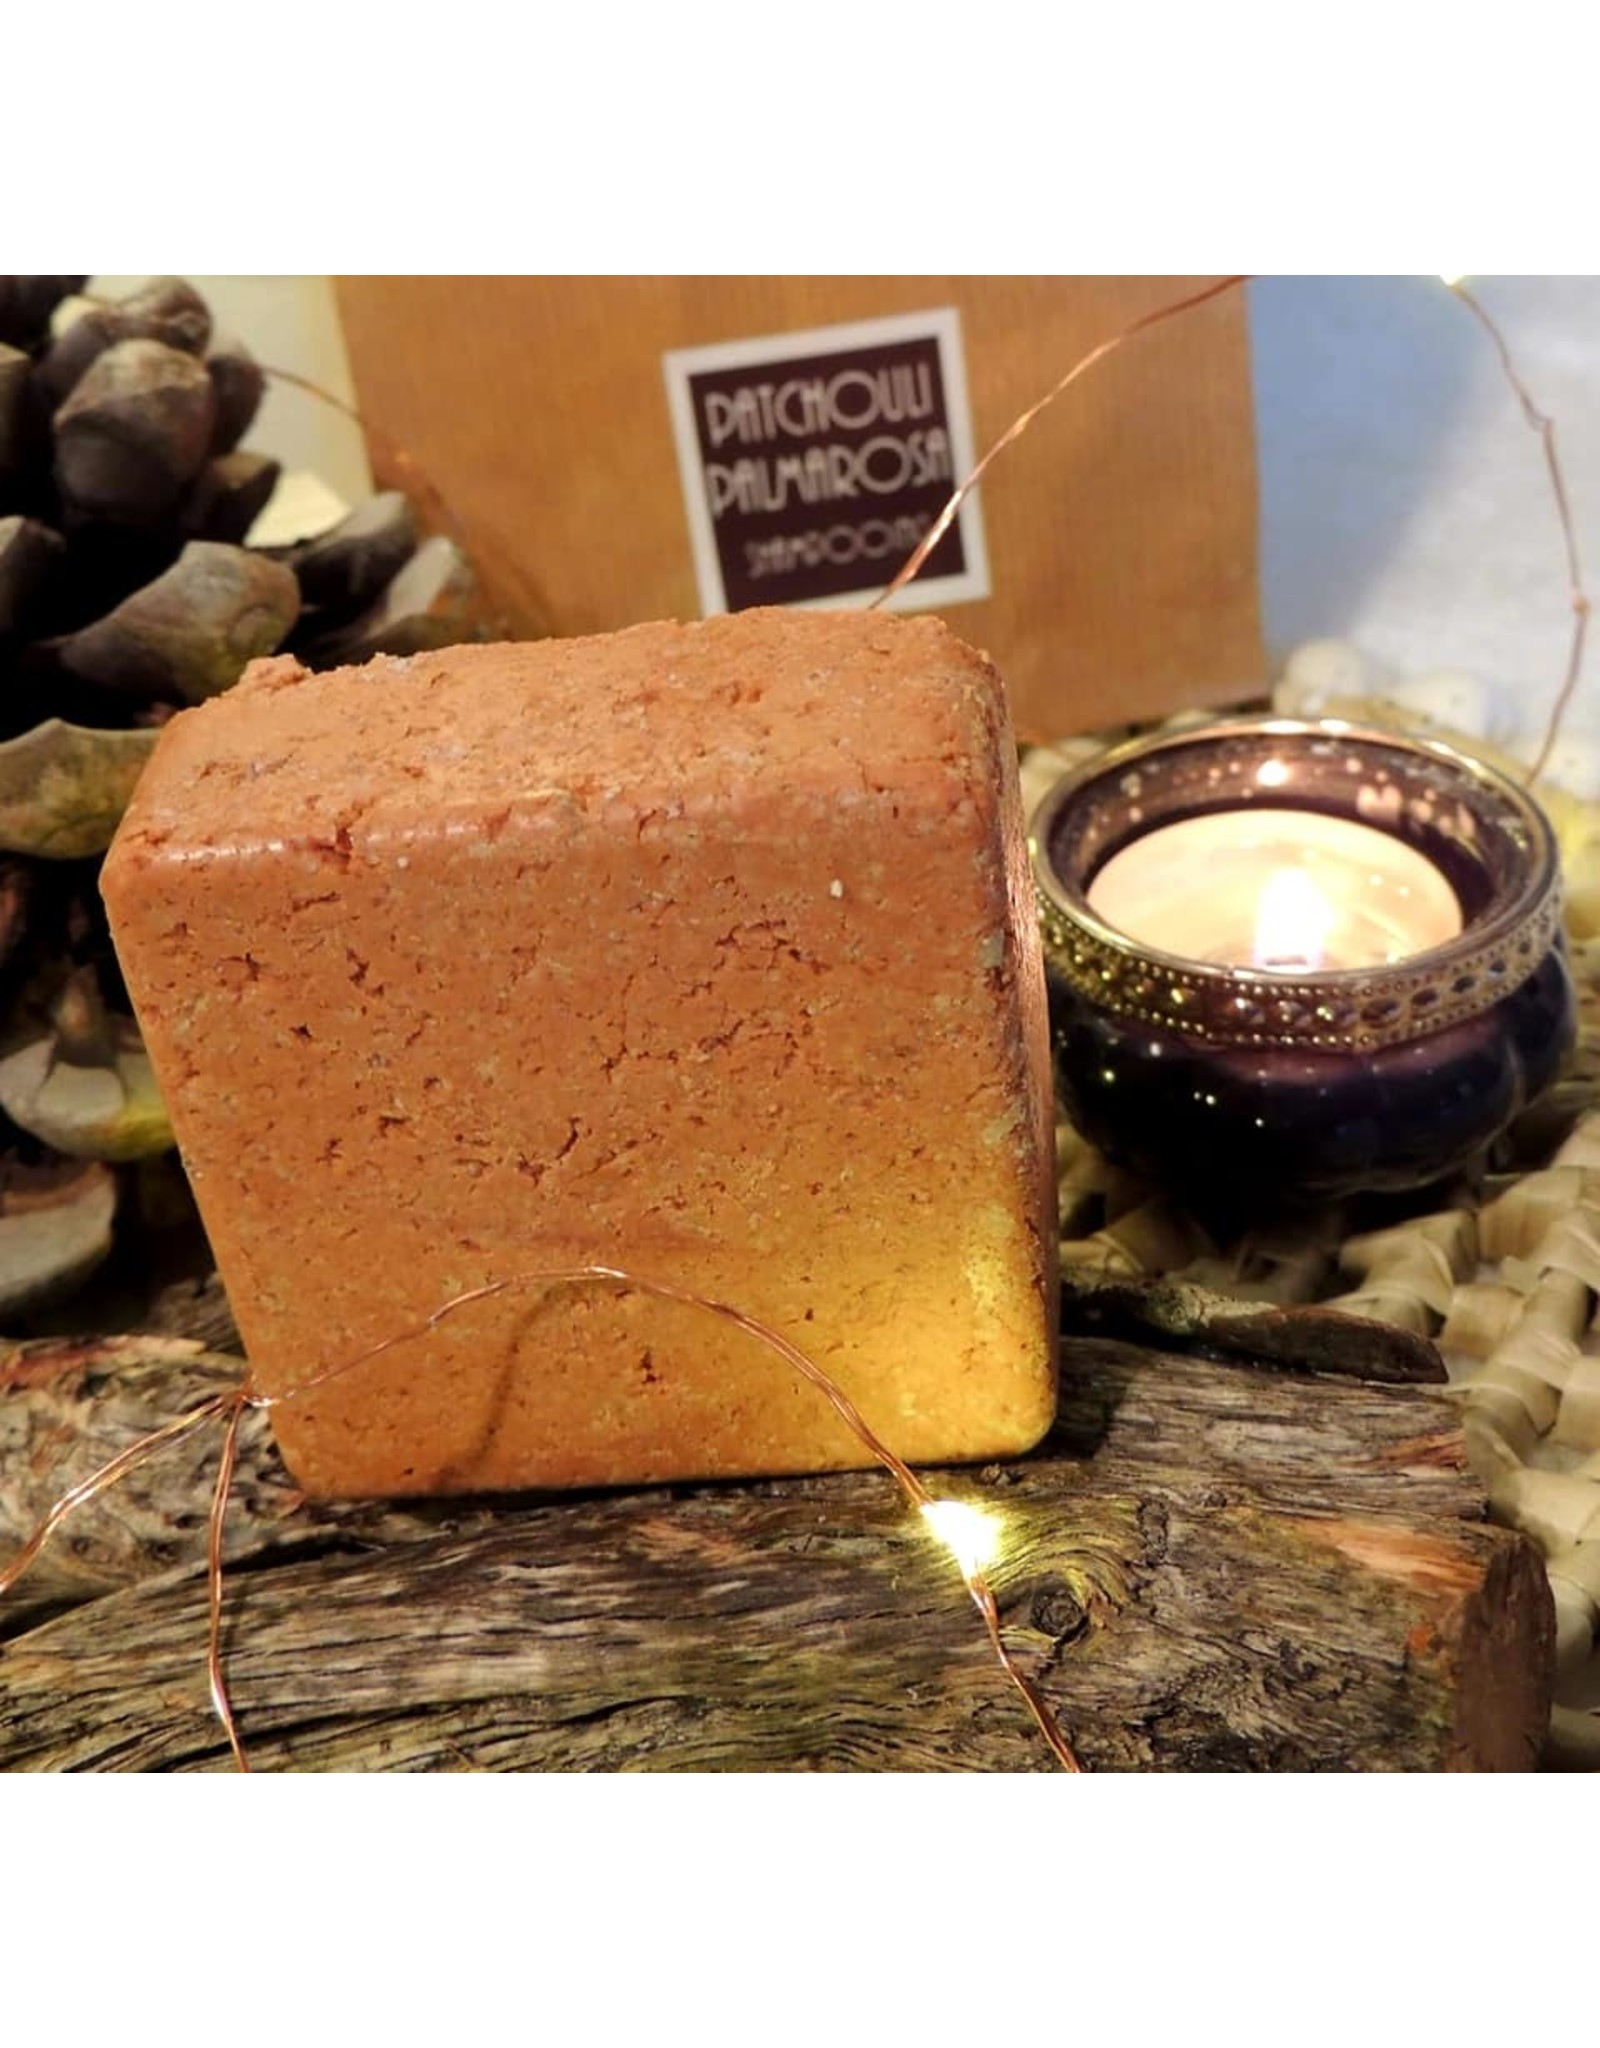 K'rolo Cosmetics Shampoing solide Patchouli-Palmarosa